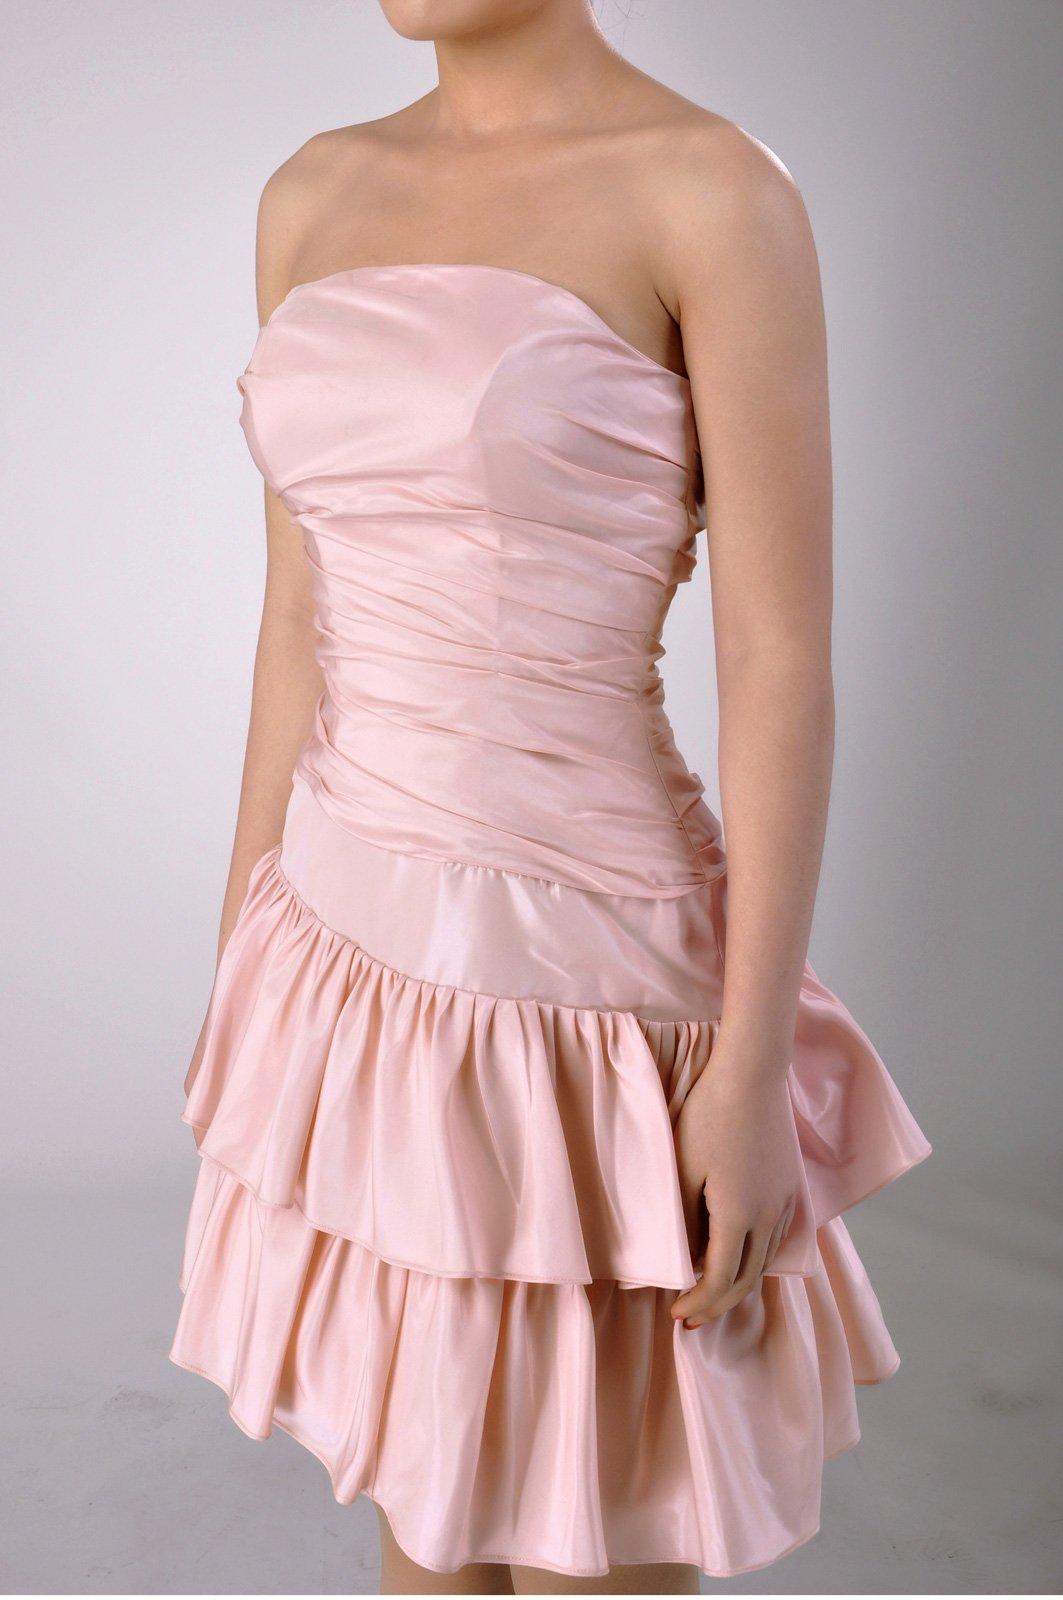 Taffeta Natrual Bateau Short Strapless Homecoming Modest Bridesmaid Dress Short, Color White,14 by Adorona (Image #6)